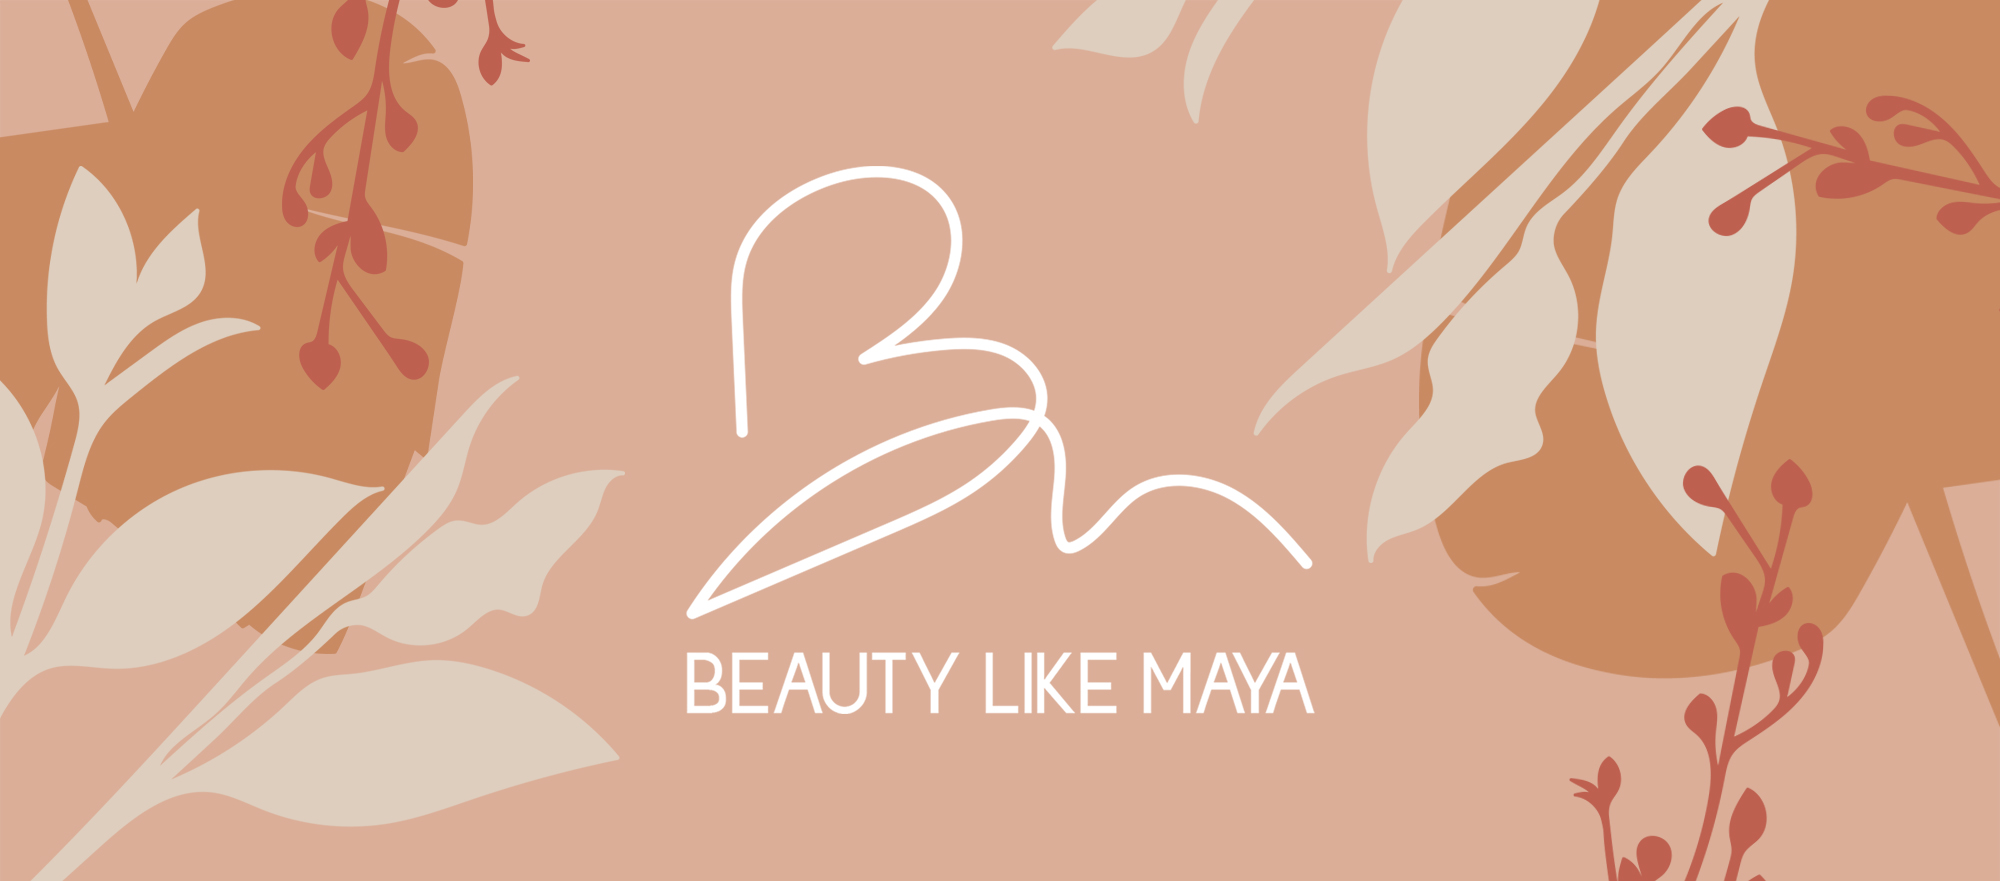 Branding Beauty like Maya 02 - studio katipeifer